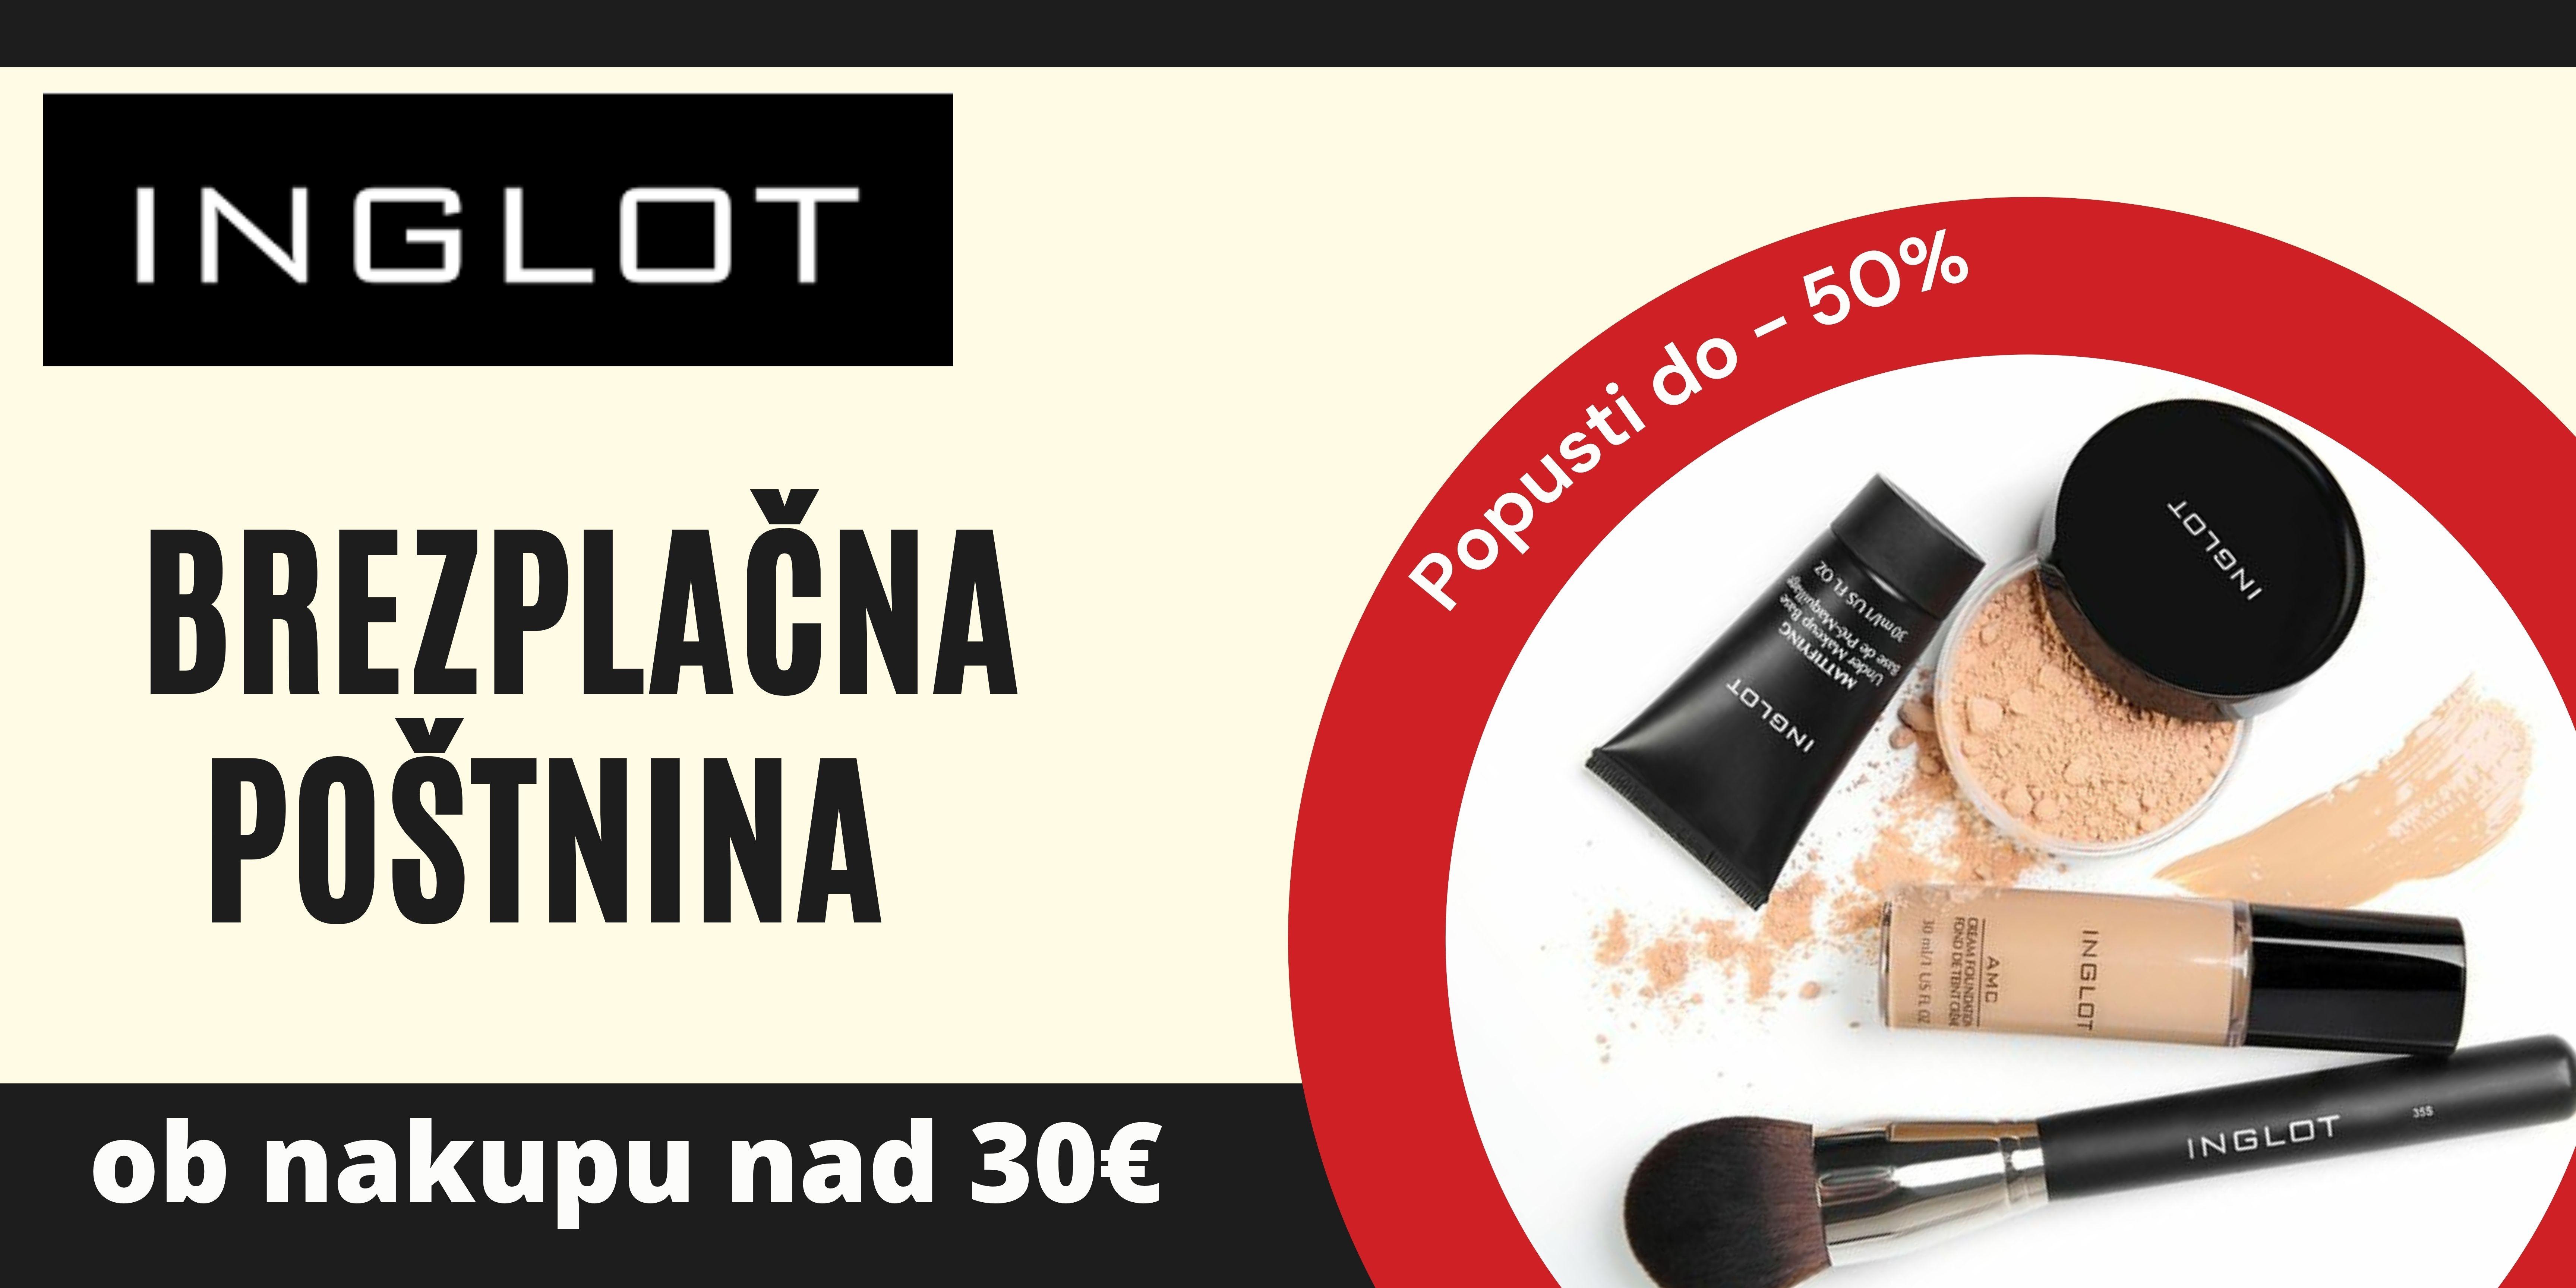 www.inglot.si